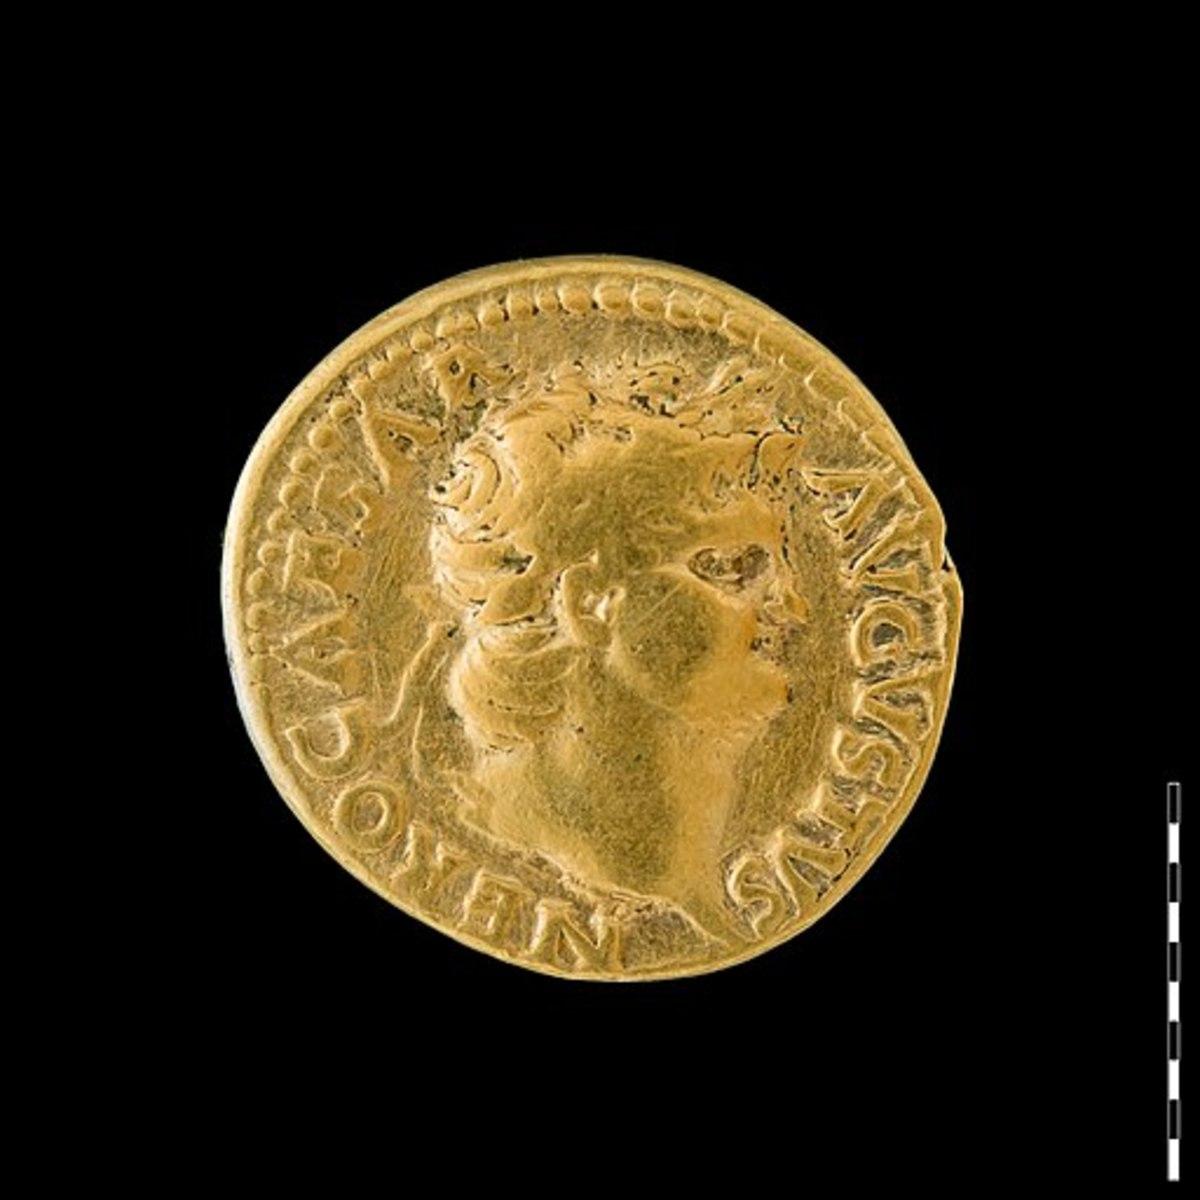 Roman coin of Emperor Nero